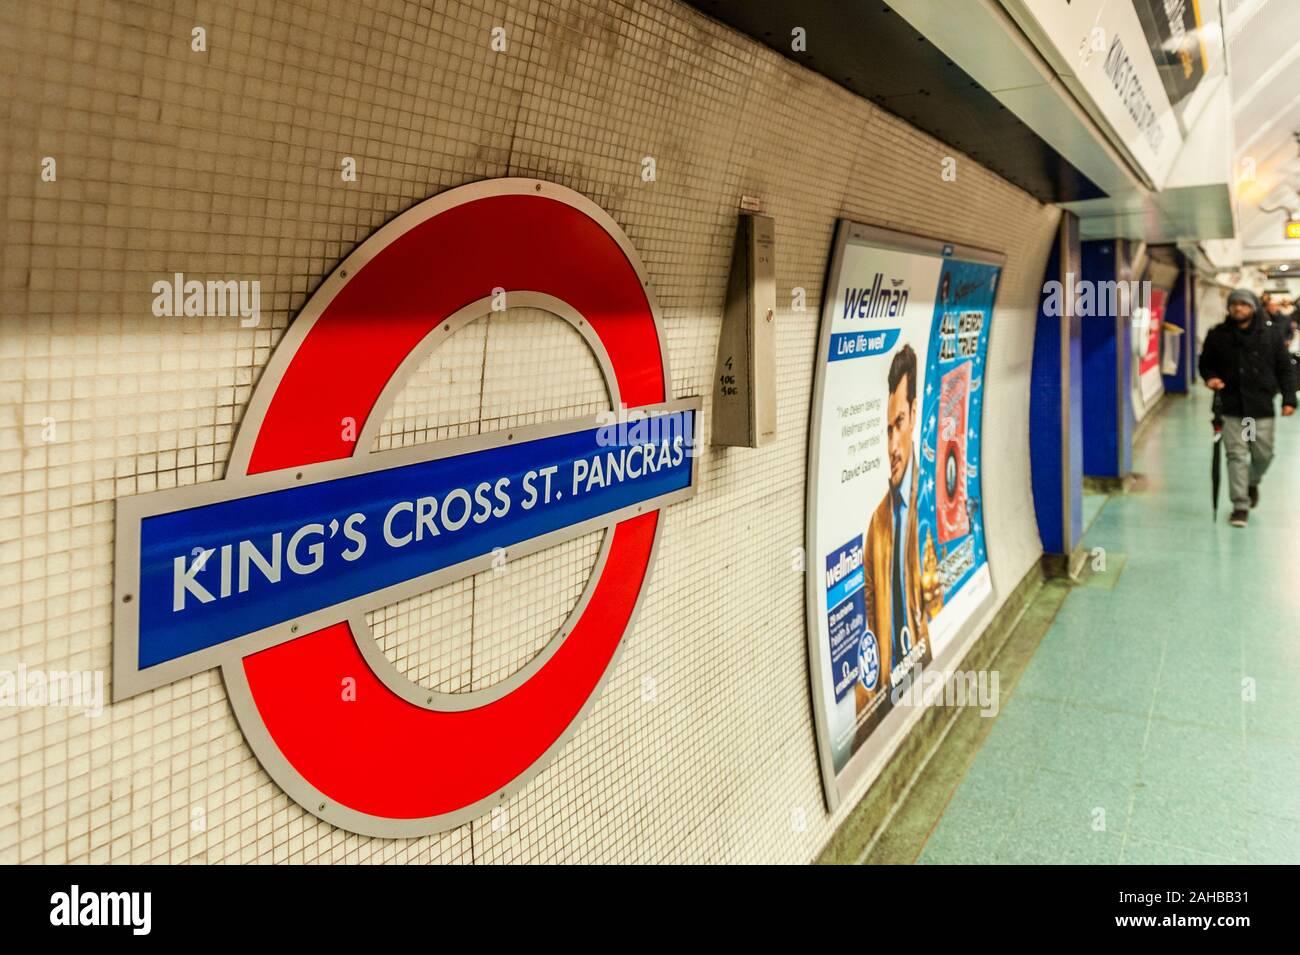 london-underground-london-uk-2AHBB31.jpg